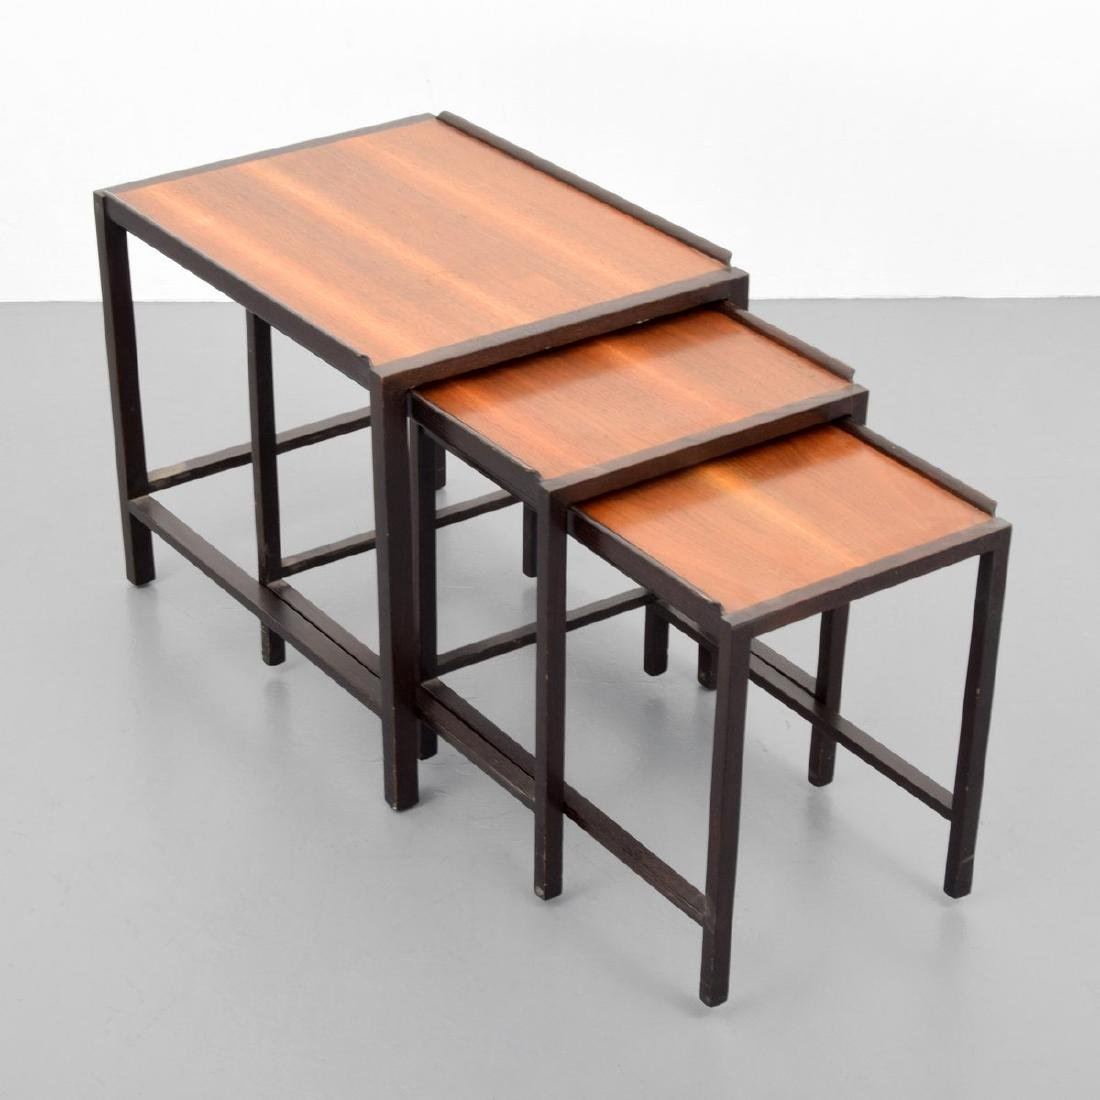 Edward Wormley 2-Tone Nesting Tables, Set of 3